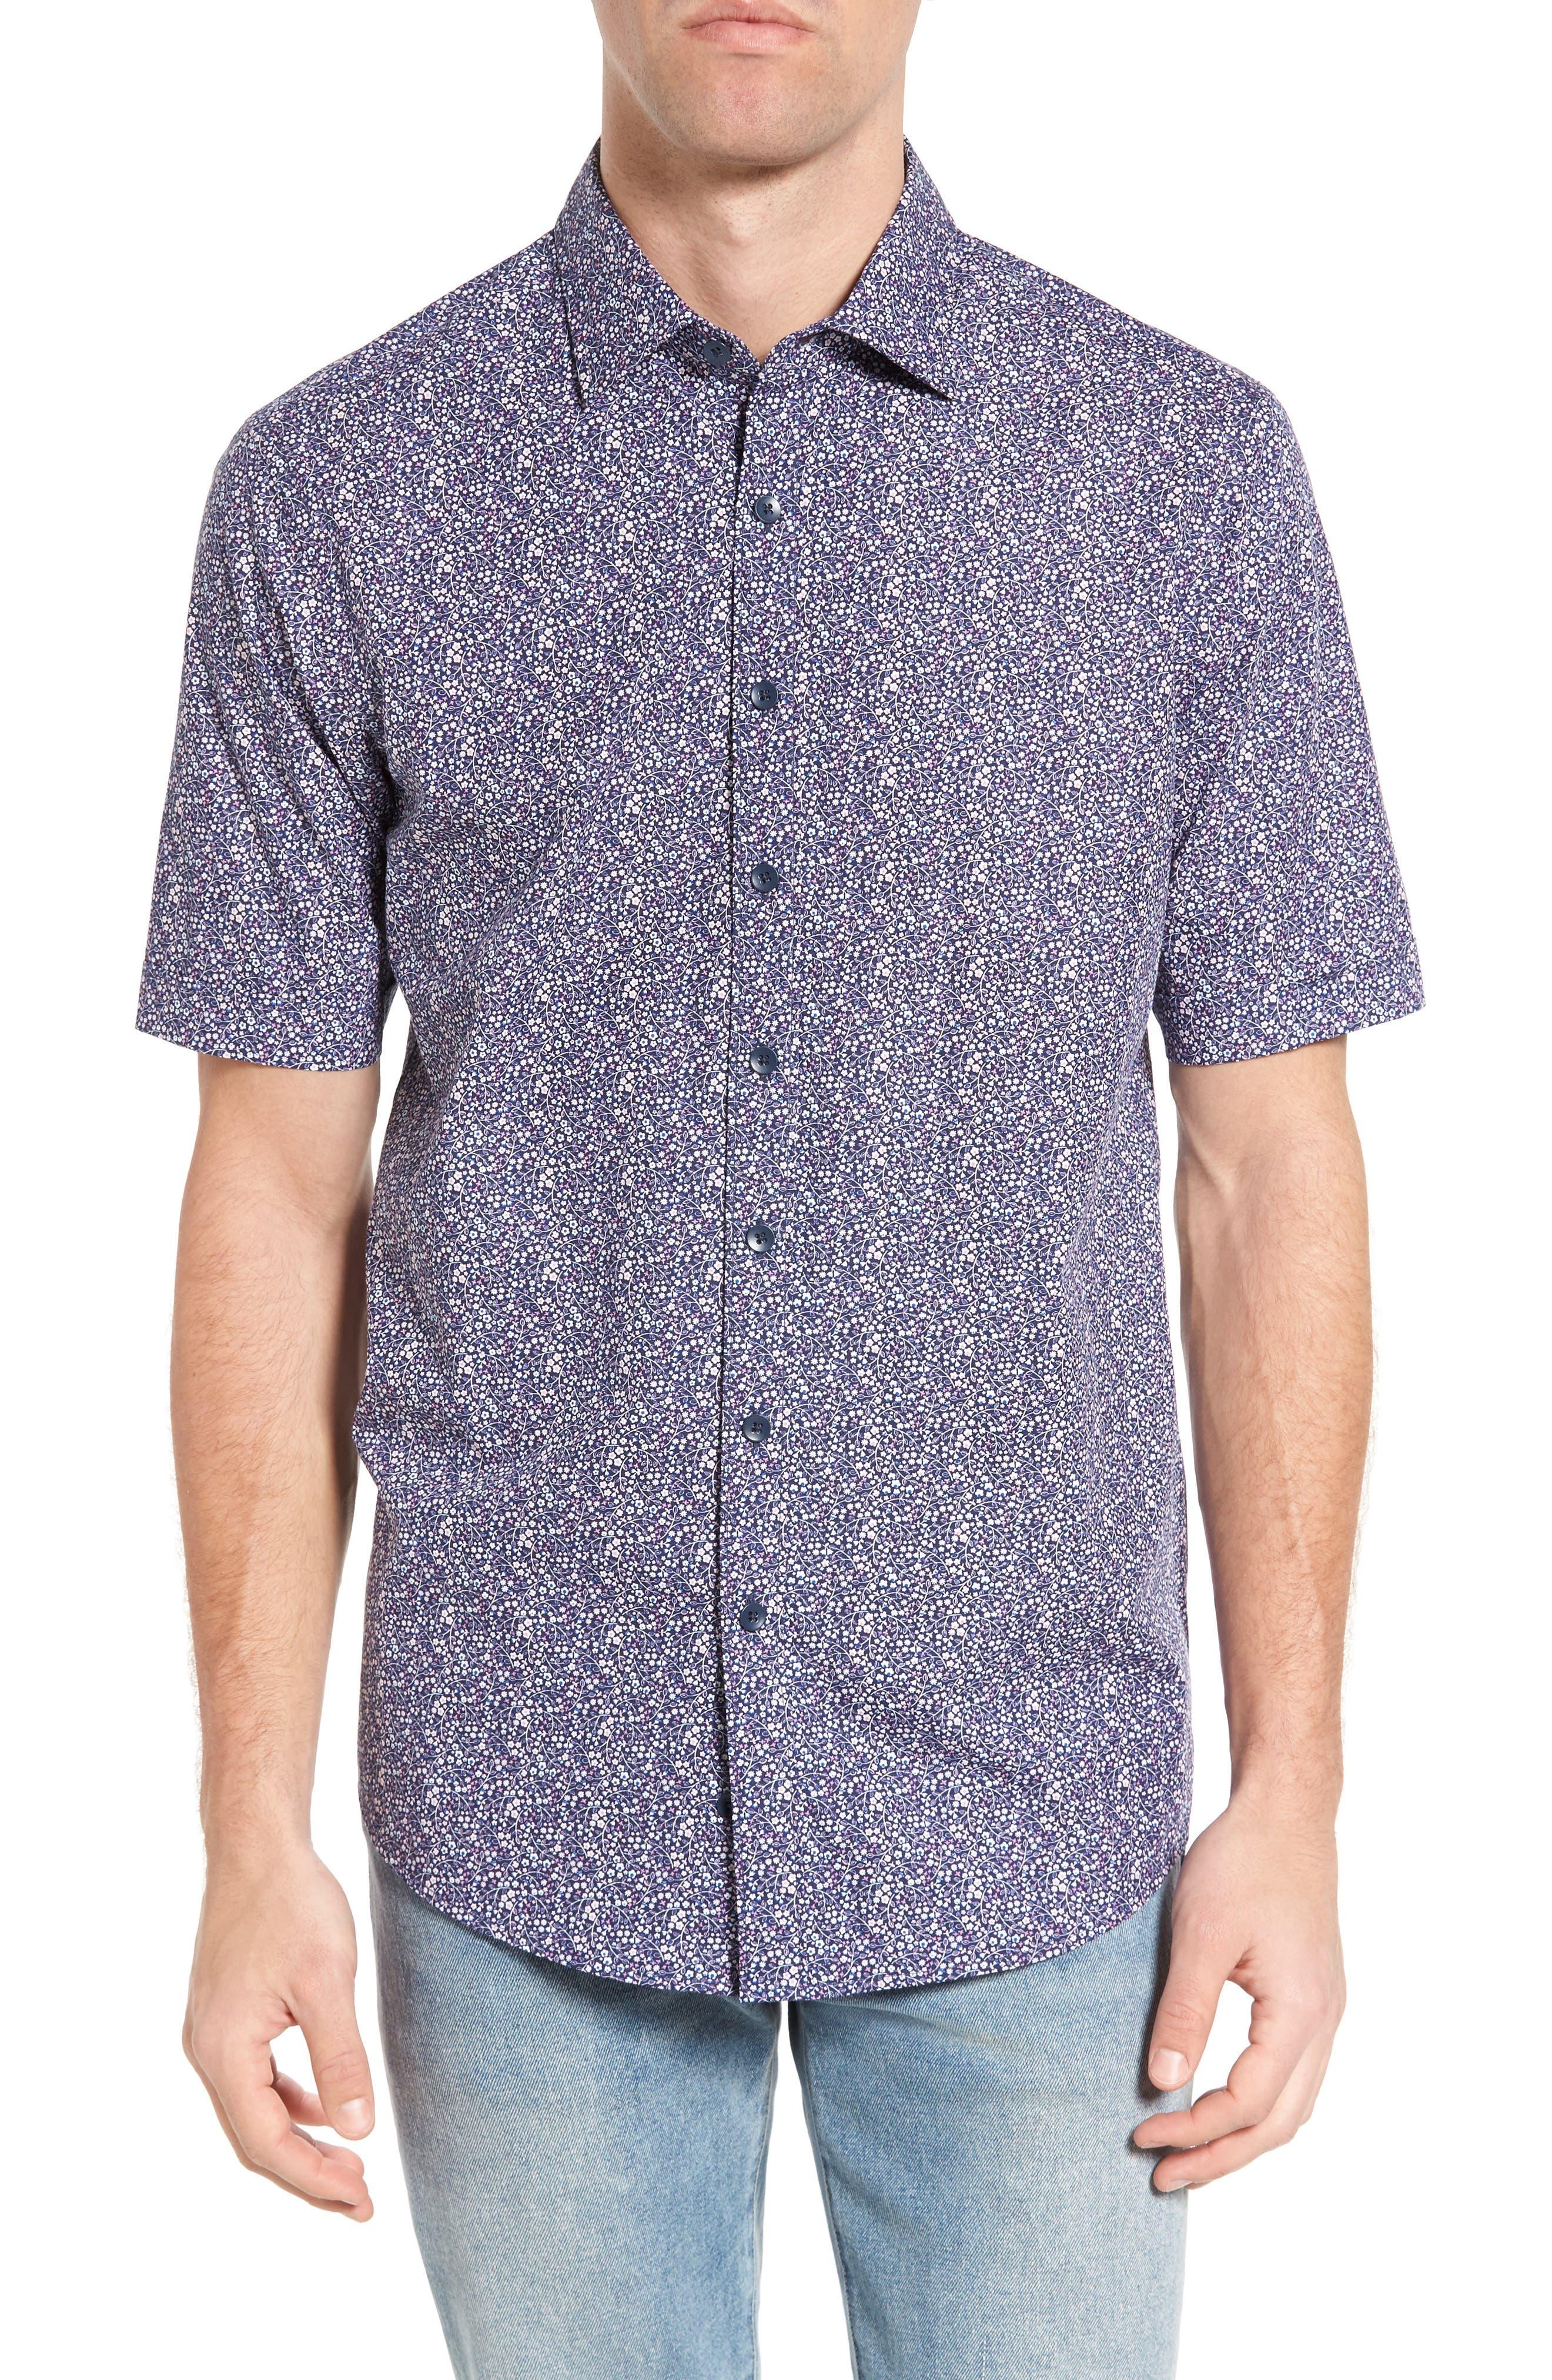 Alternate Image 1 Selected - Rodd & Gunn Lorneville Original Fit Sport Shirt